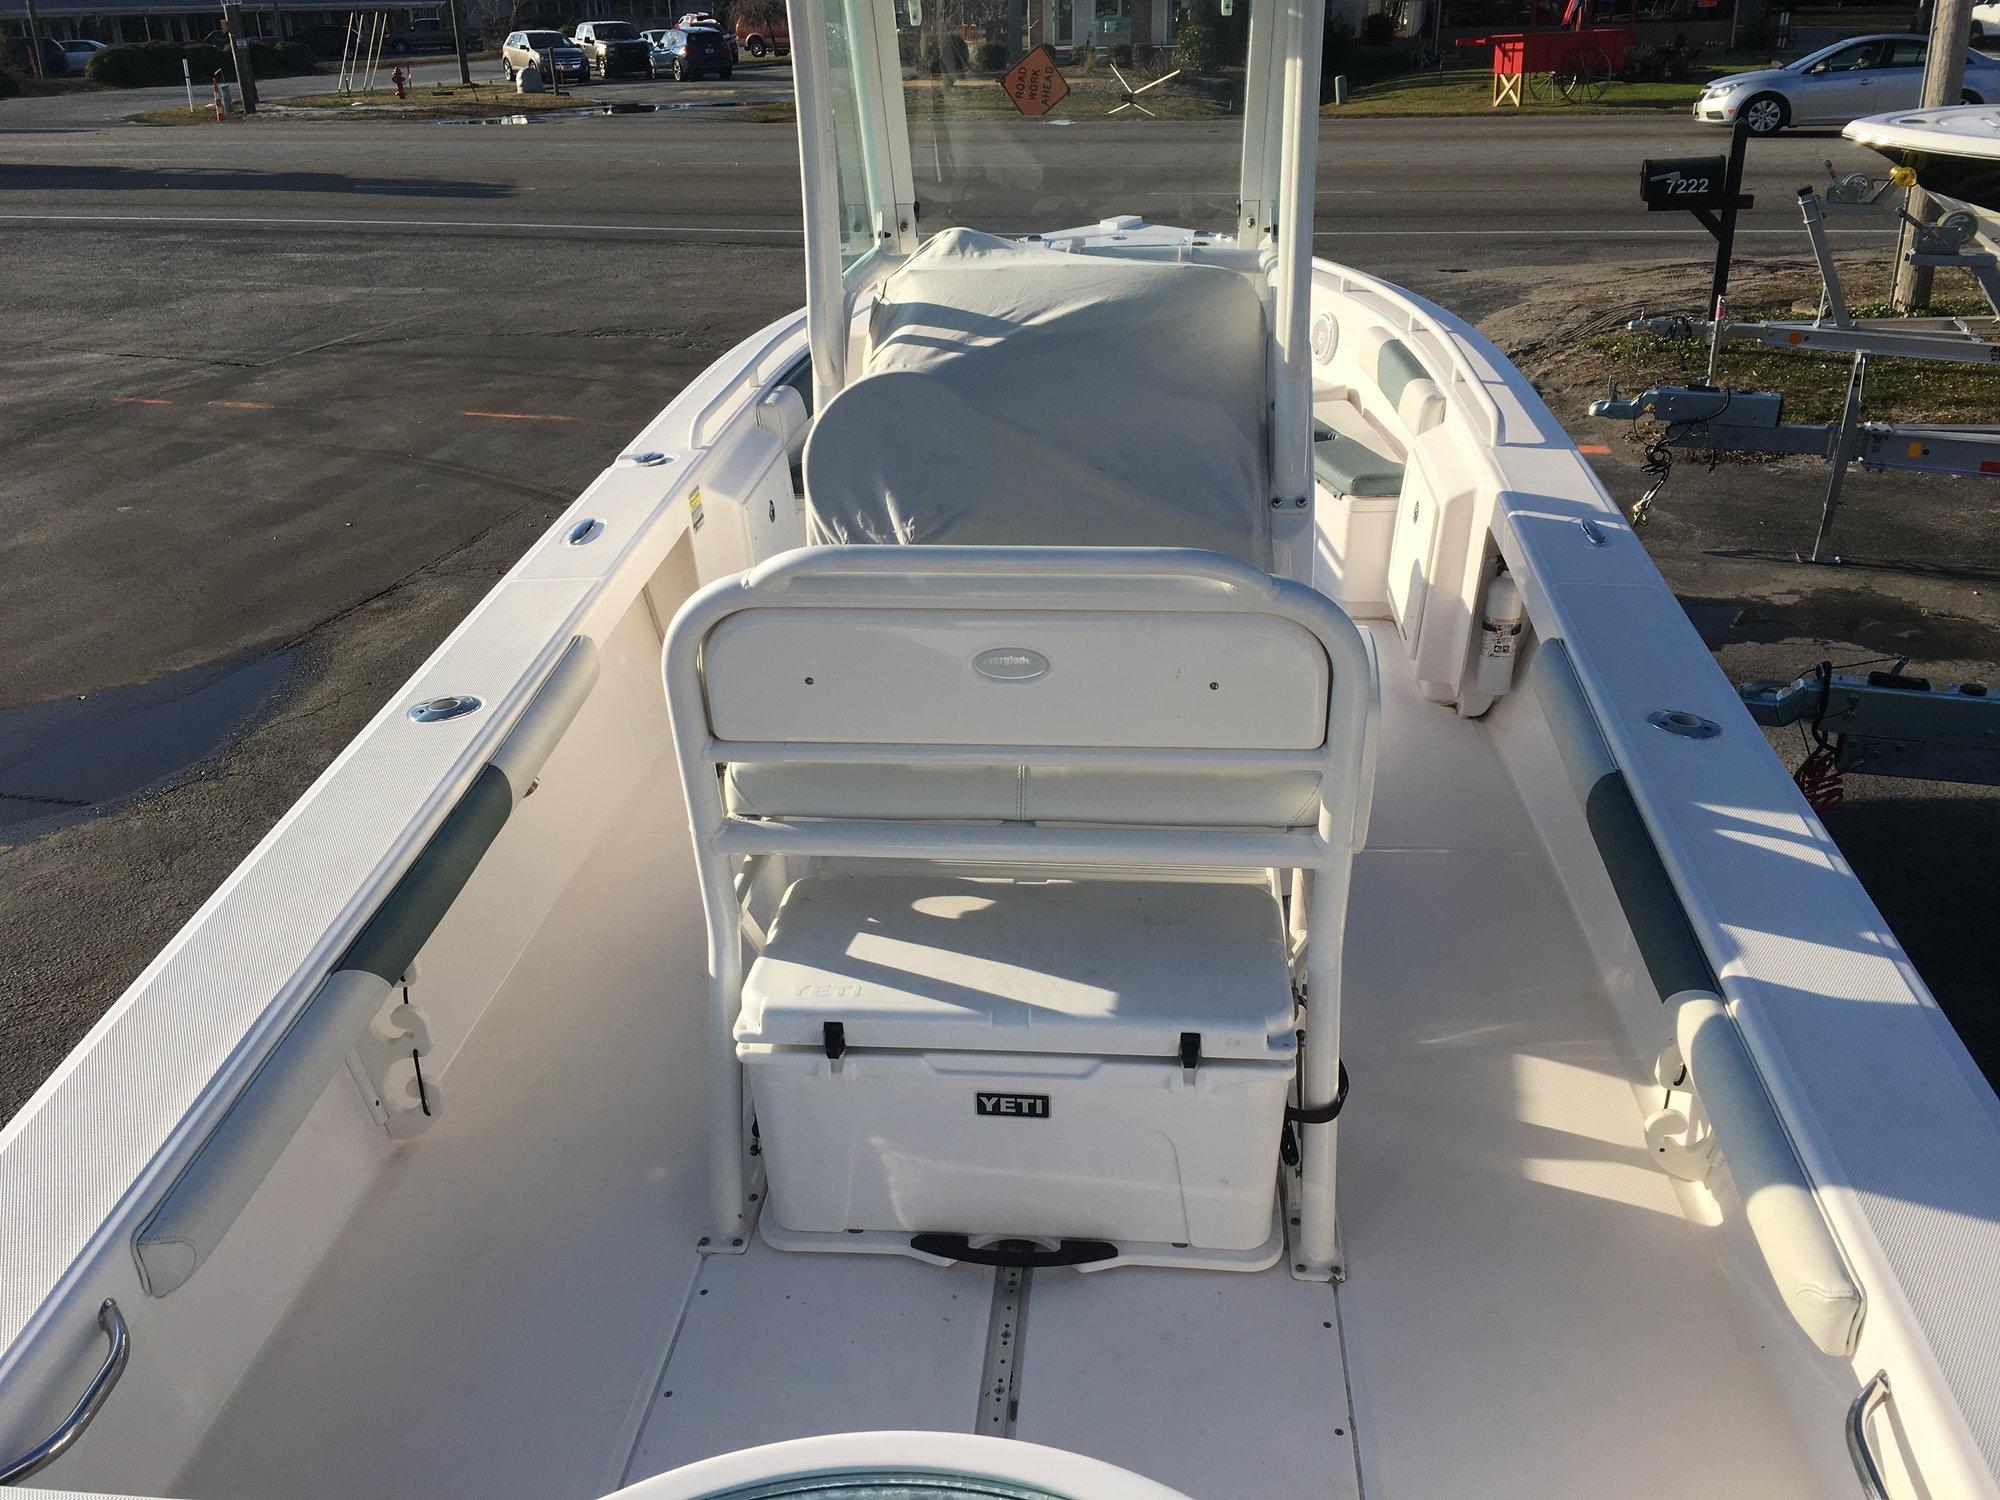 2014 Everglades 243 300 Yamaha Warranty!$69,900